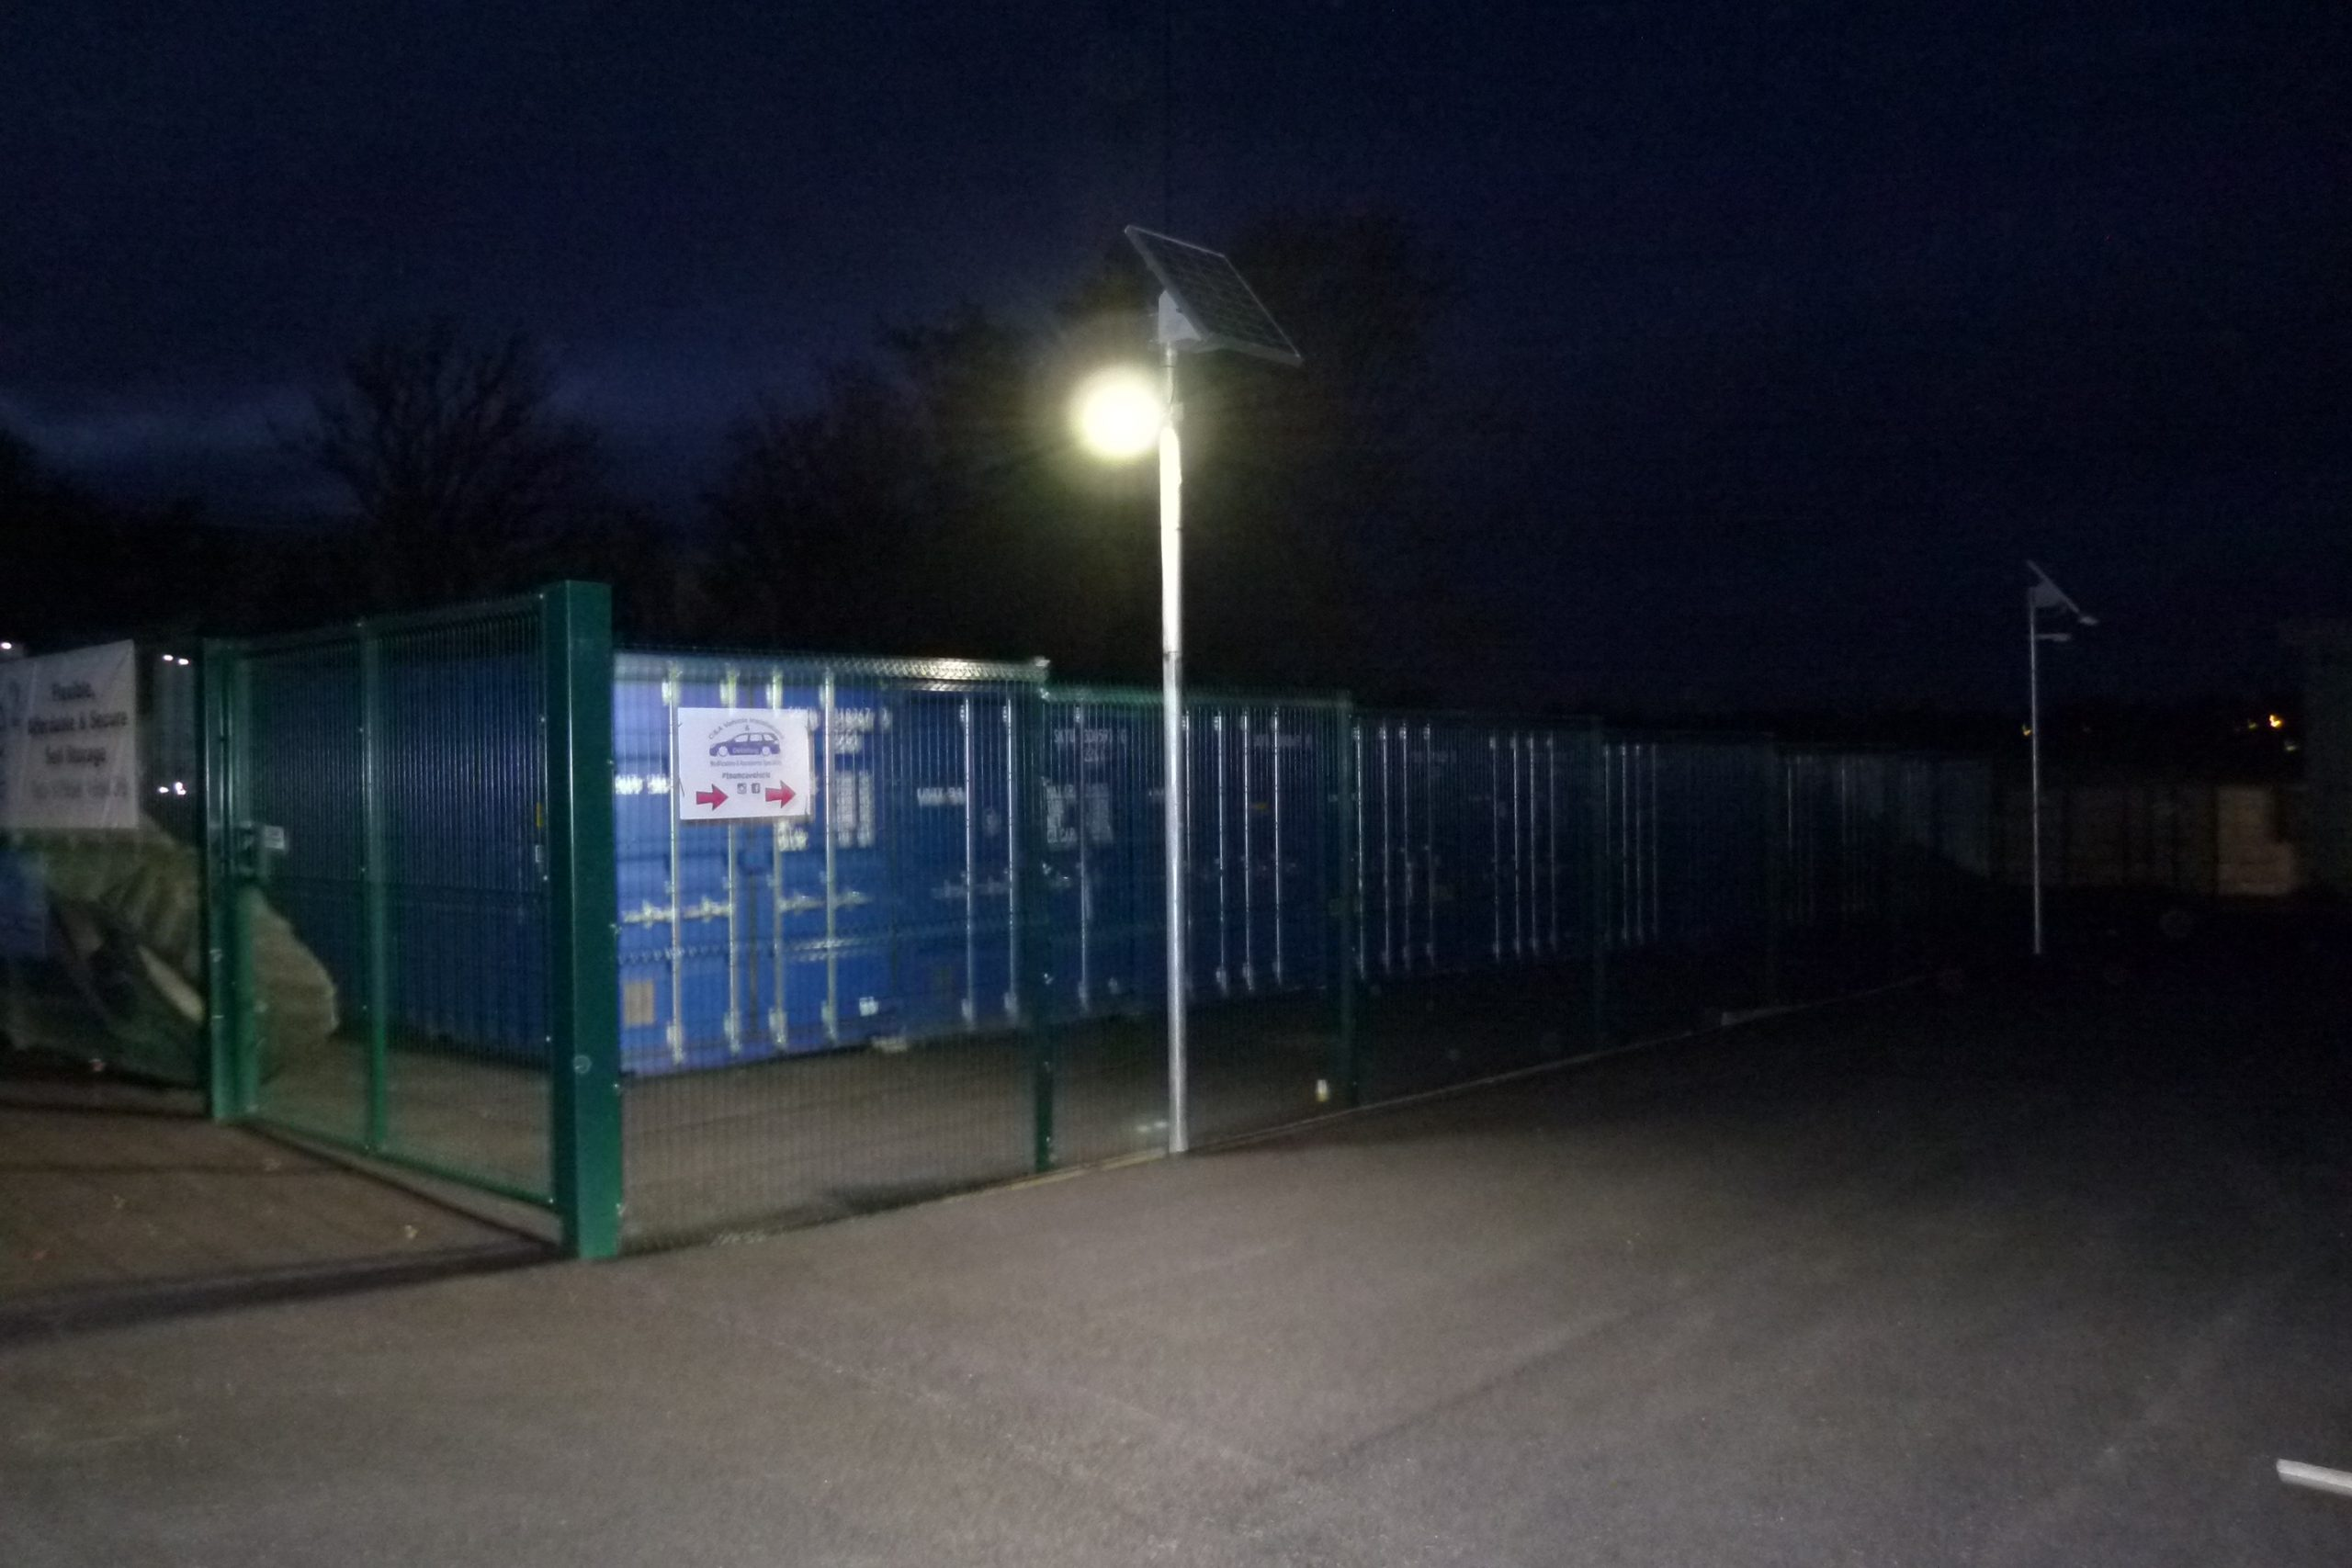 Car park solar lighting